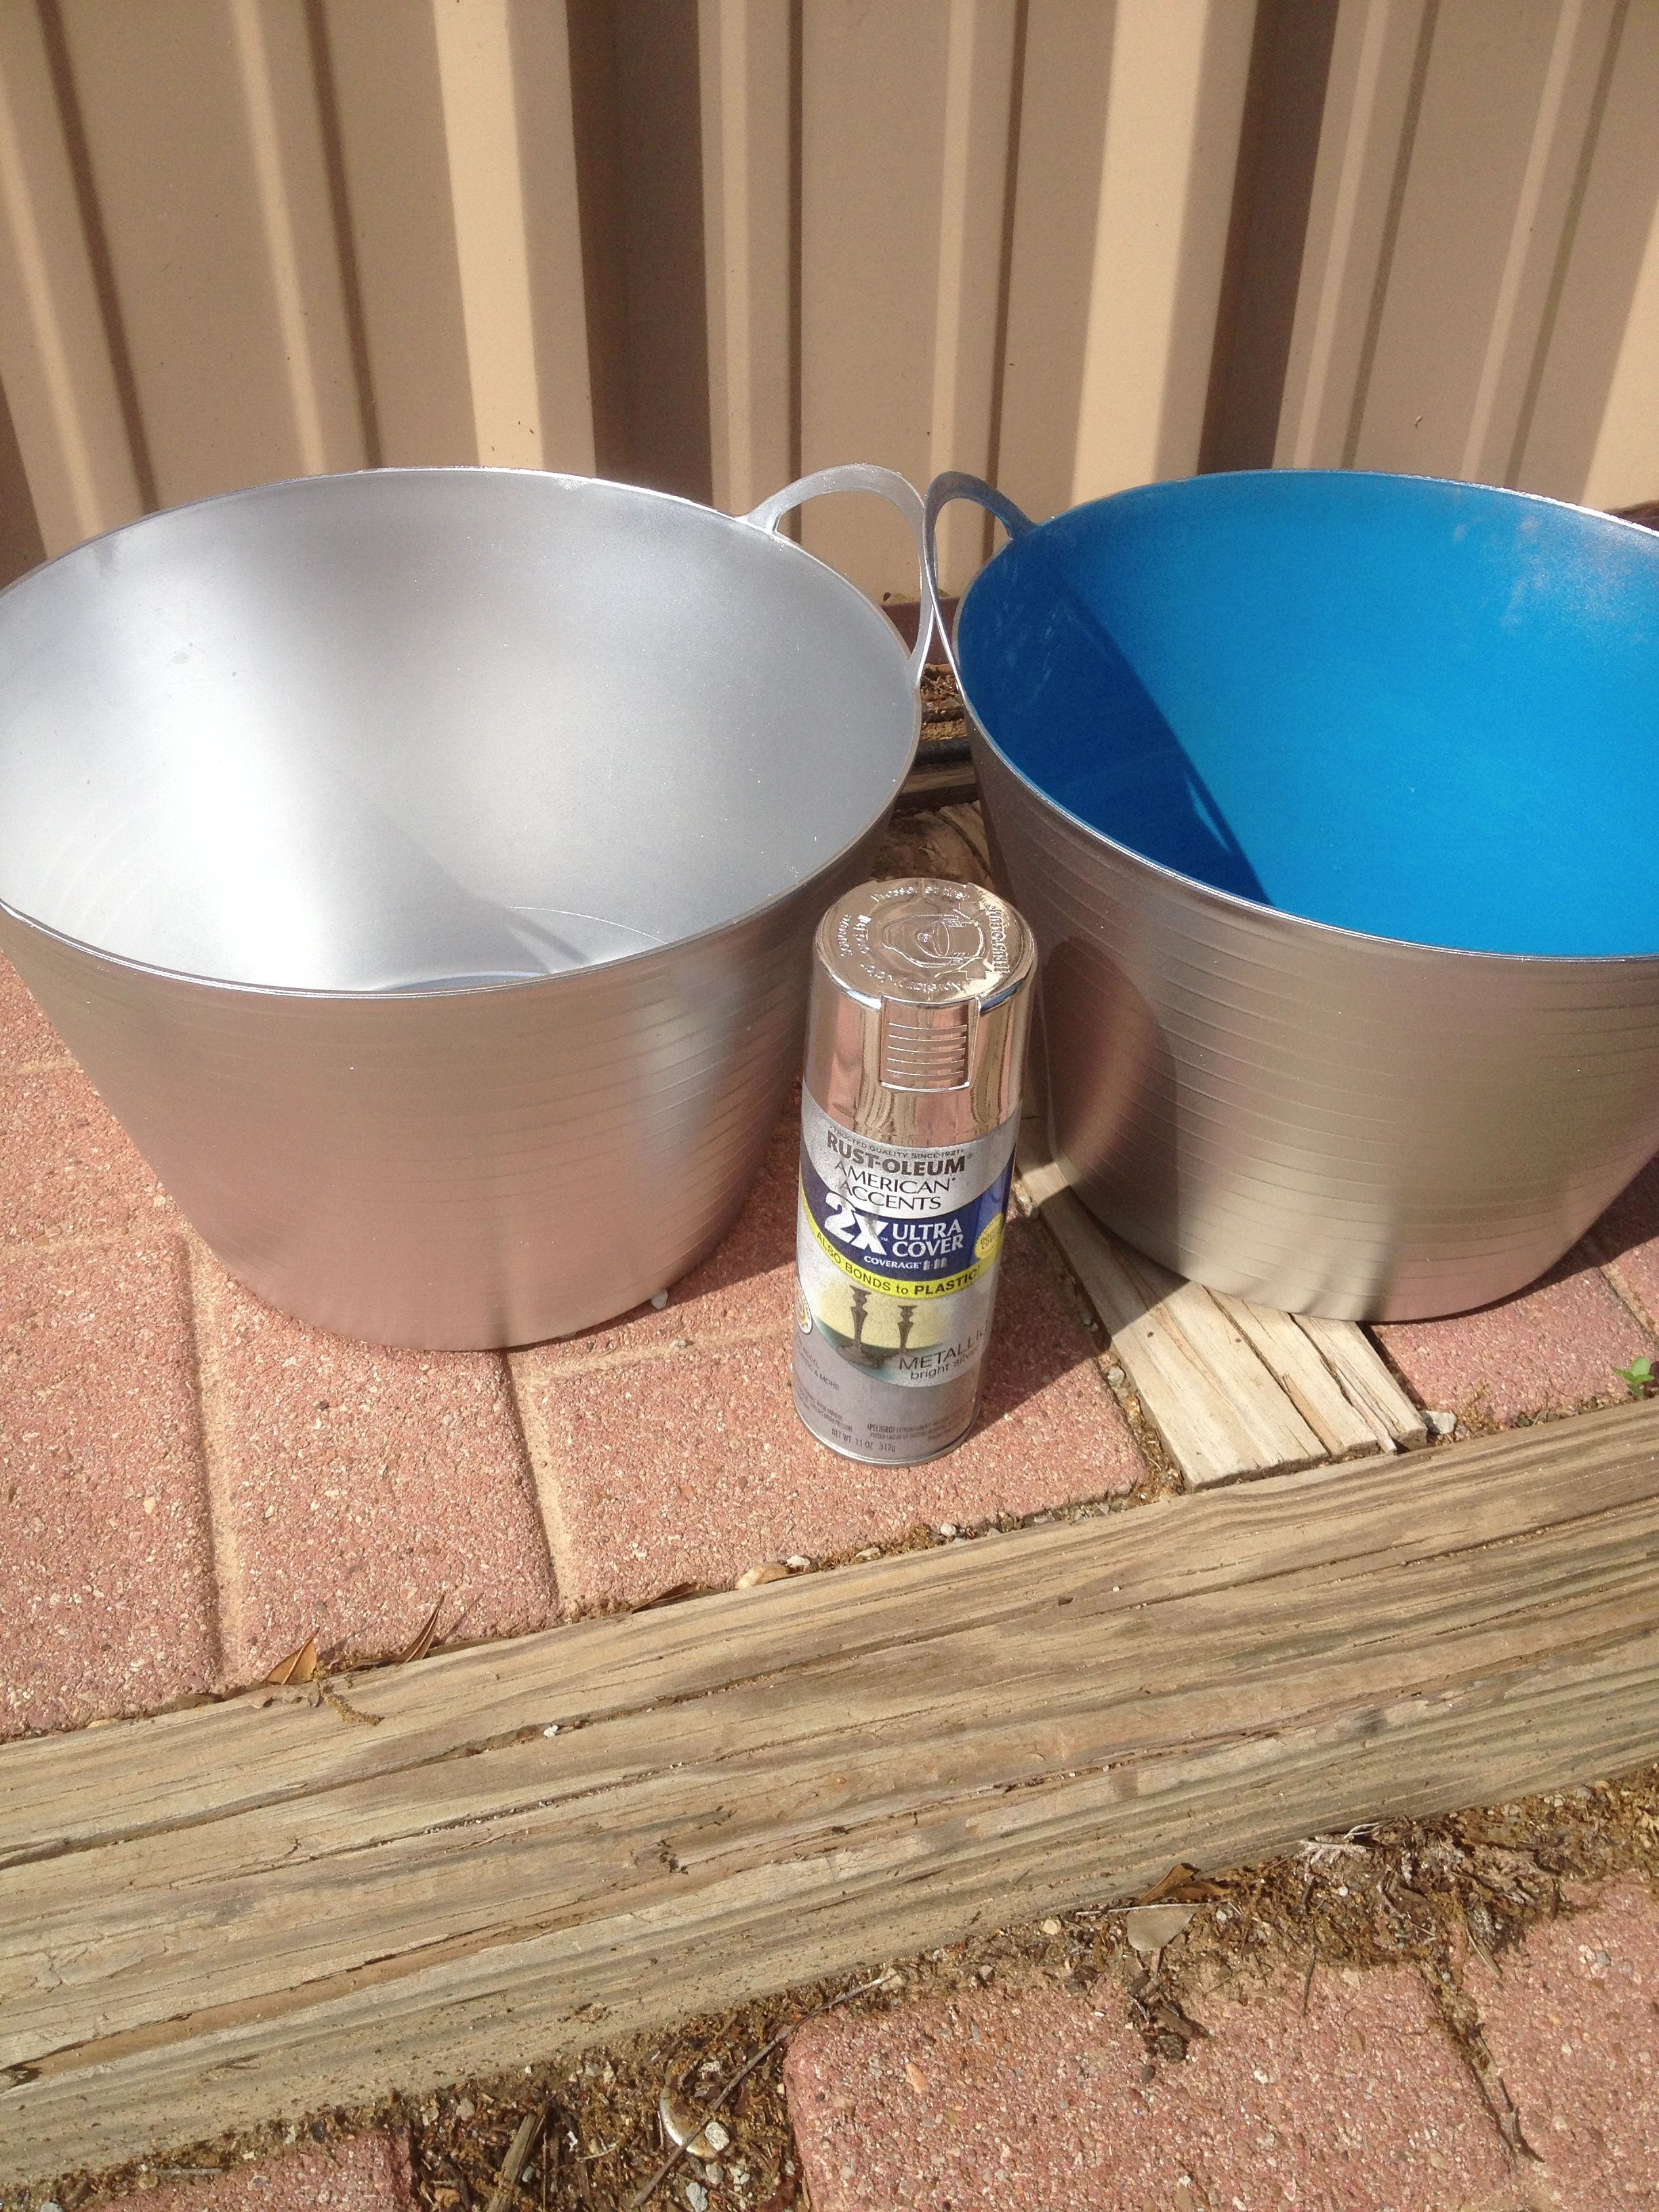 Turn Plastic Buckets Into Metal Buckets Using Metallic Silver Spray Paint Dollar Store Decor Fun Bucket Silver Spray Paint